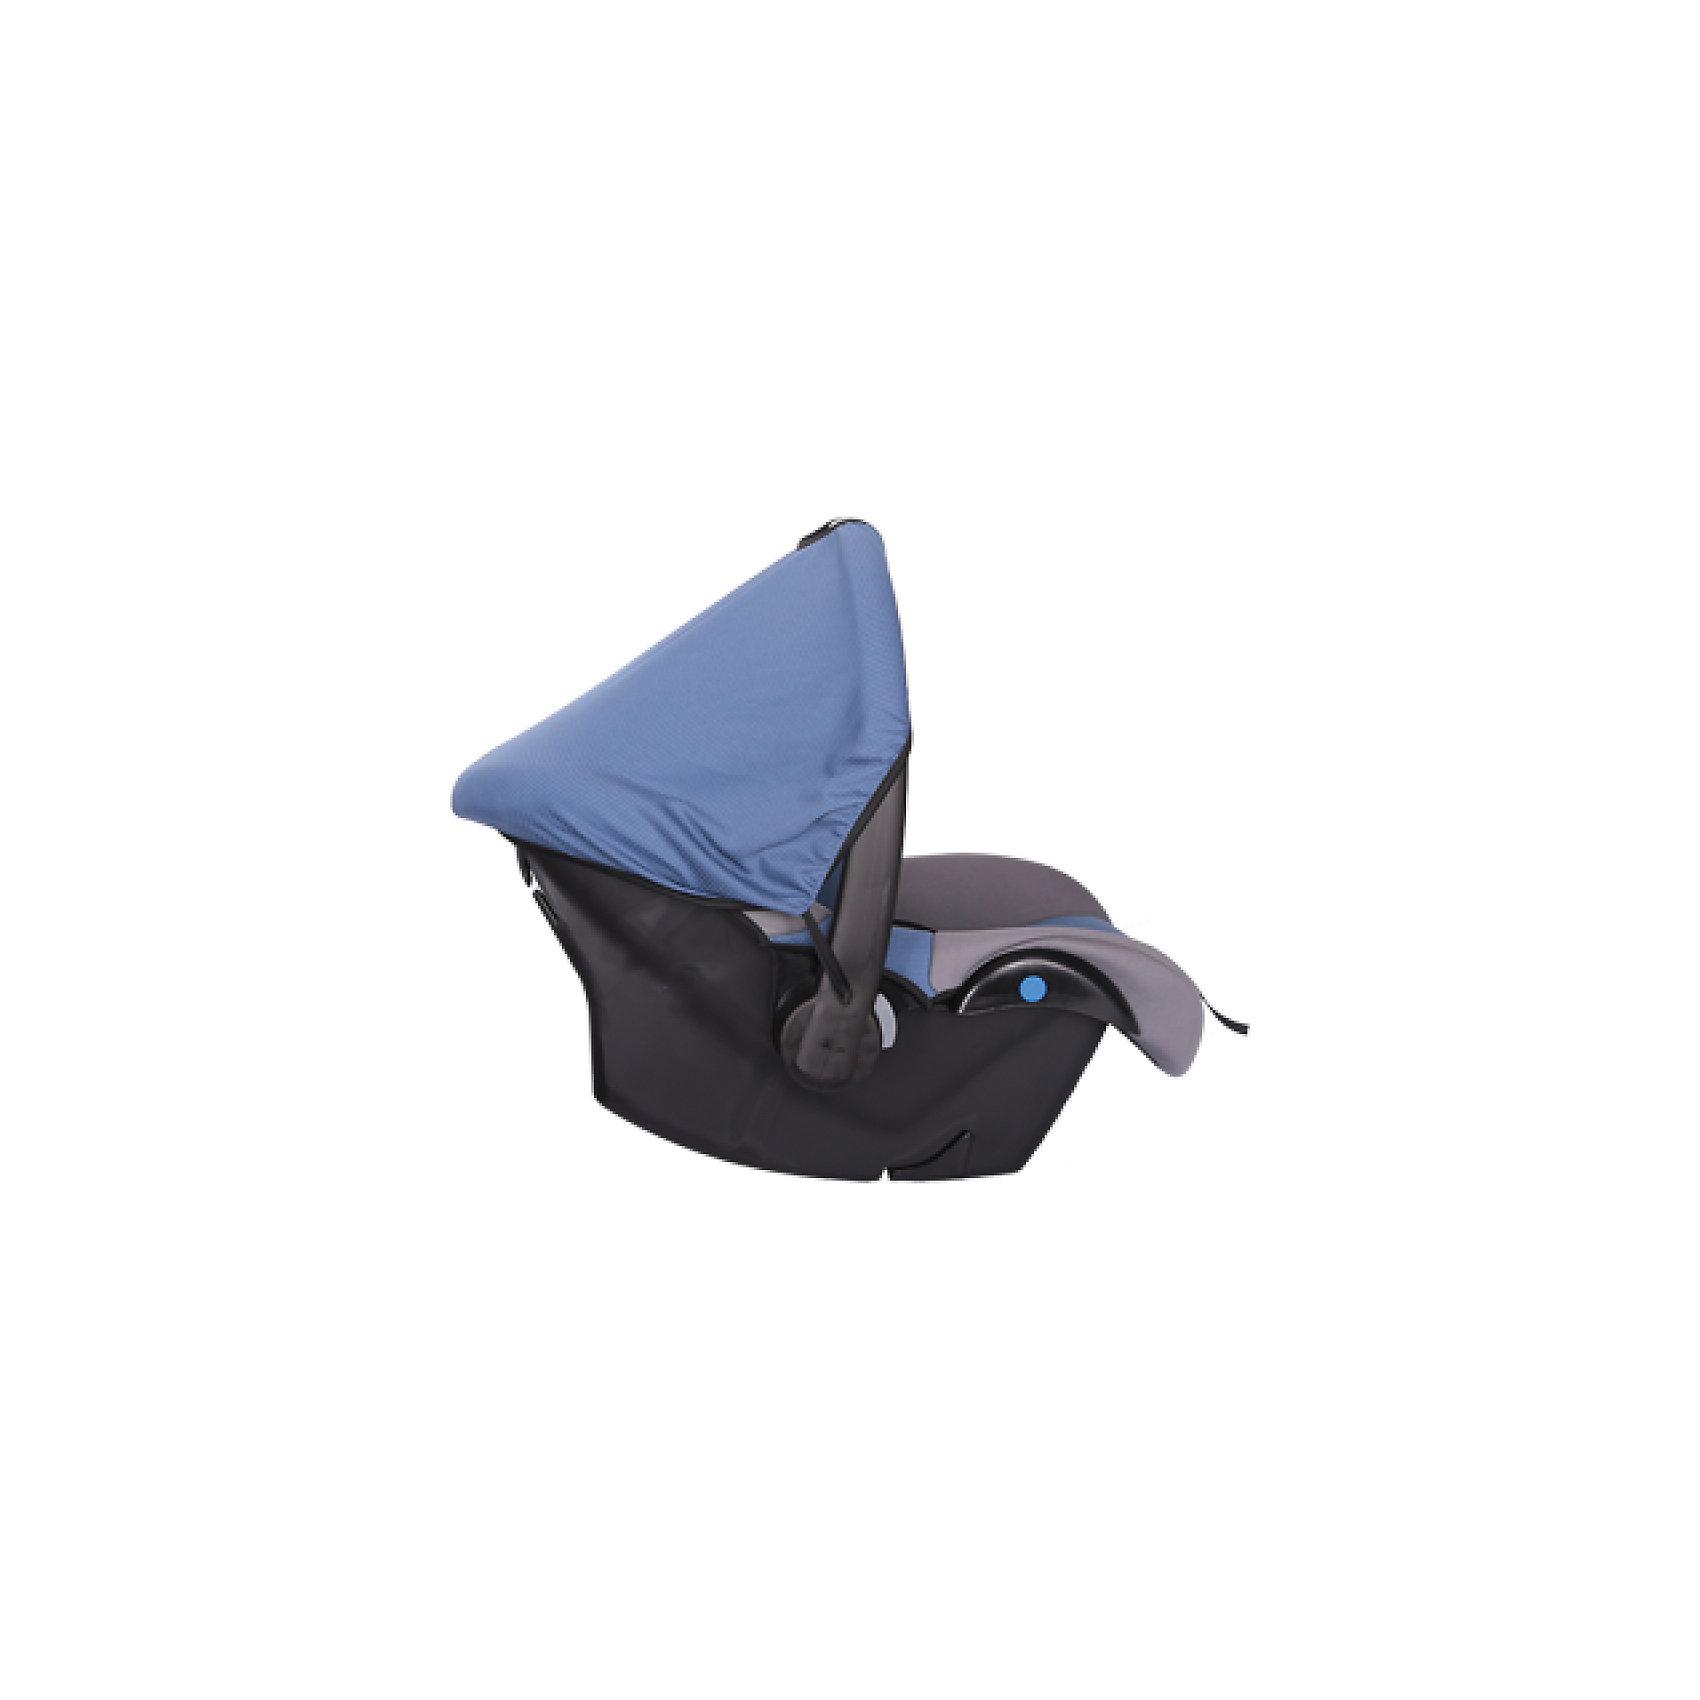 Автокресло Colibri 0-13 кг., Zlatek, синий